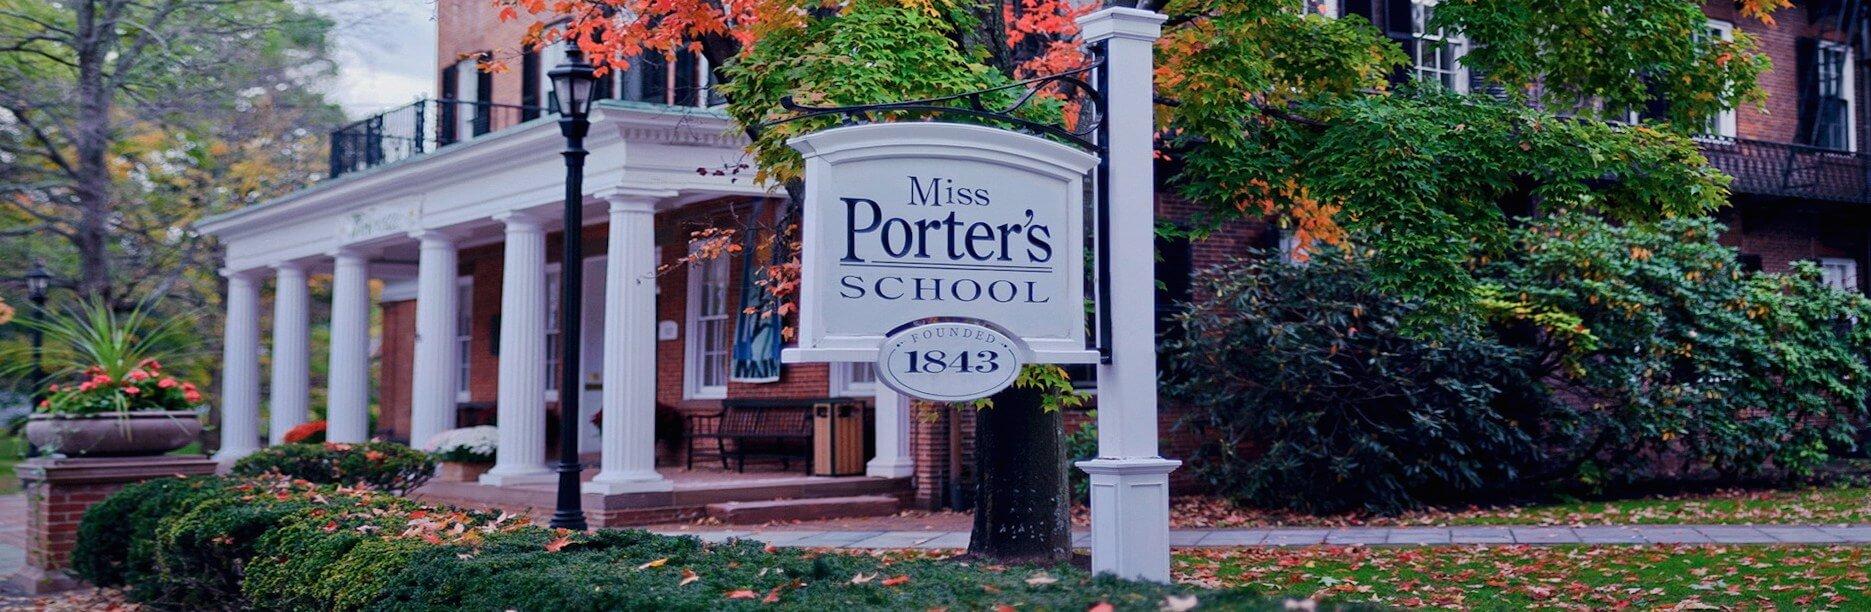 Miss Porter's Community Service - Johndrow Wealth Managment